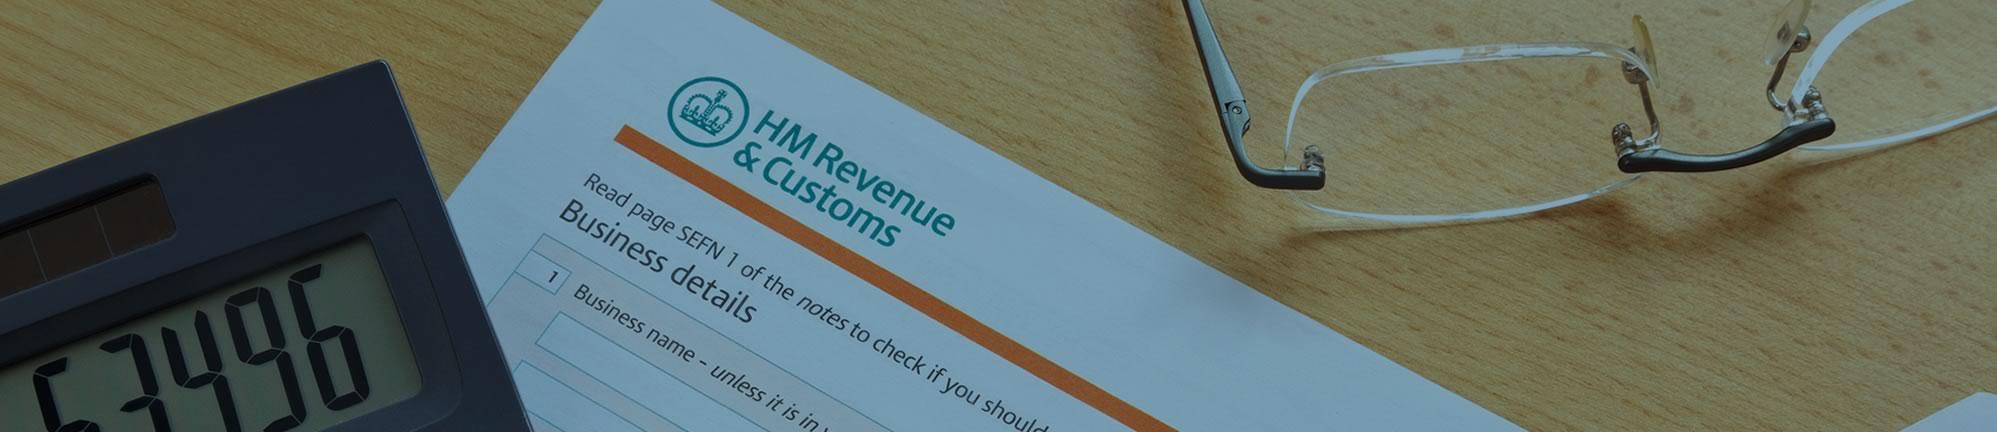 HMRC Tax Investigations